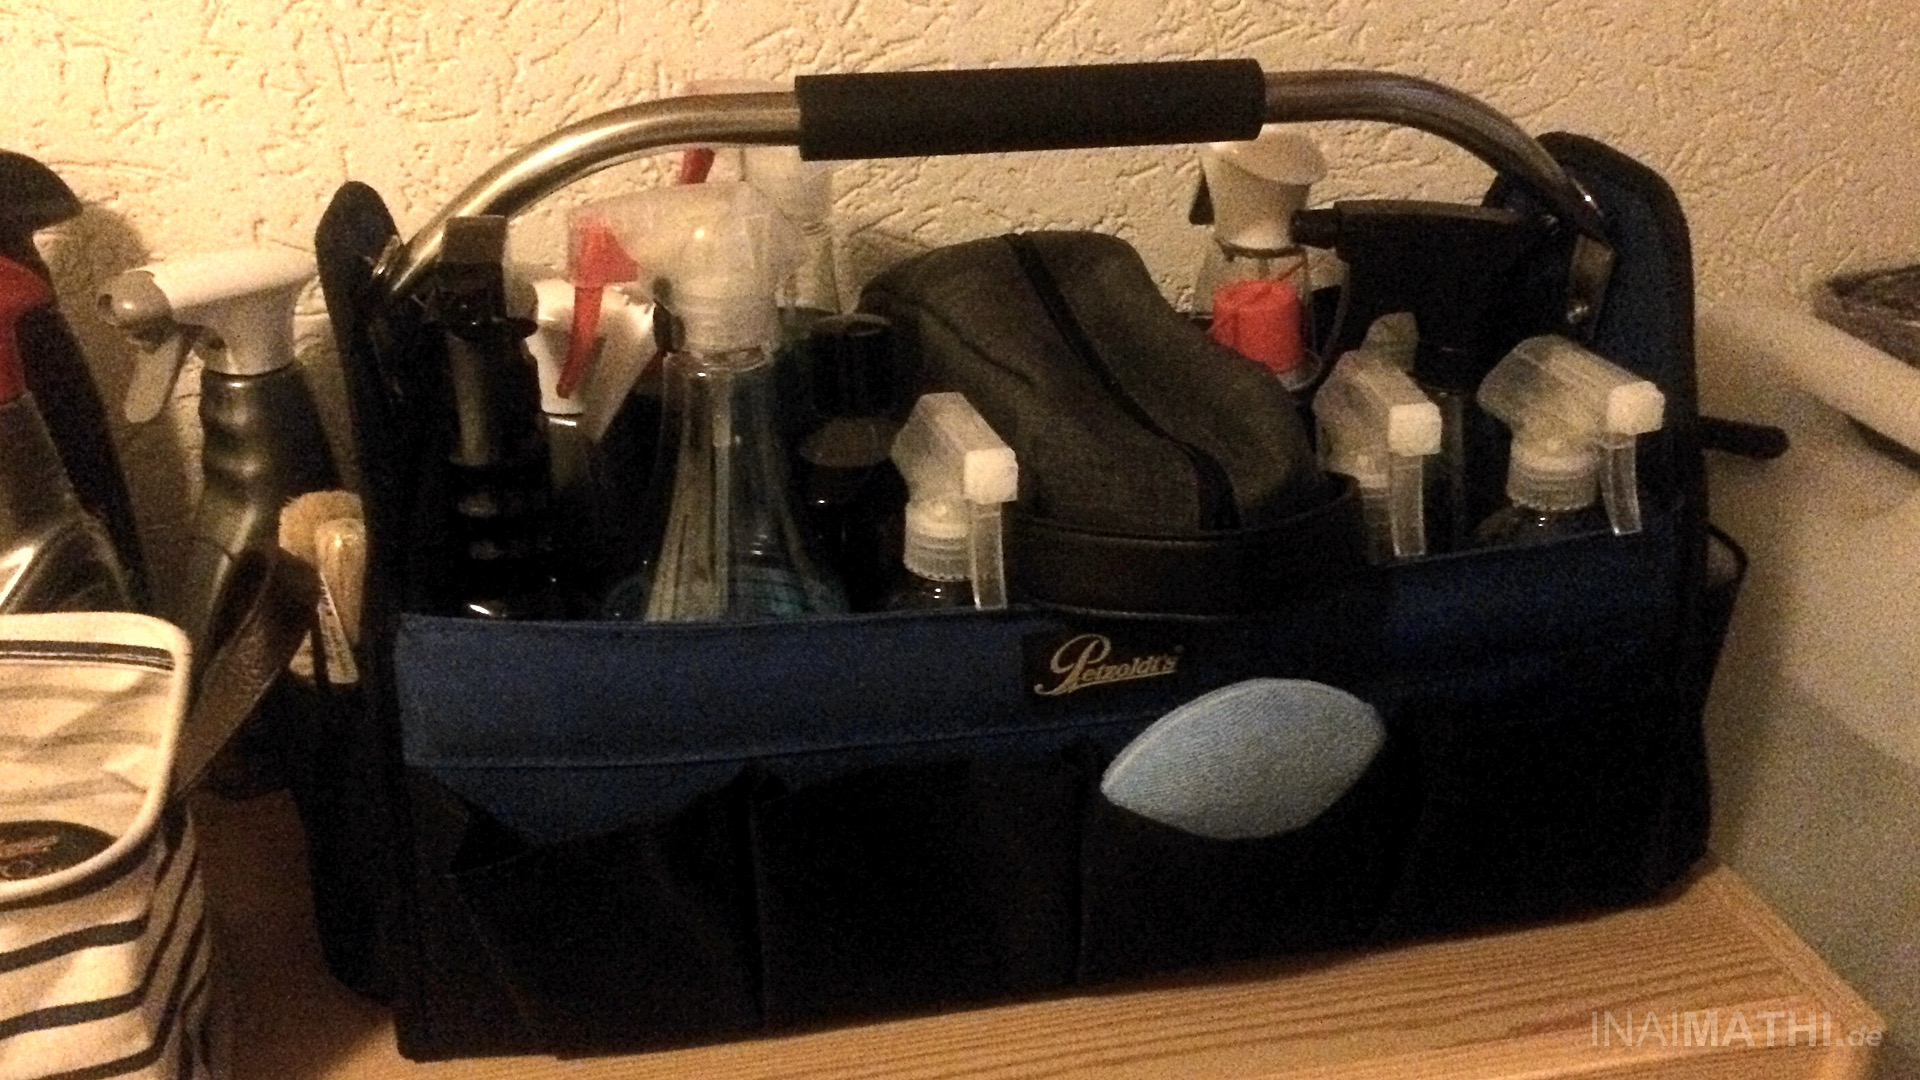 Petzoldt's XXL Autopflege-Tasche